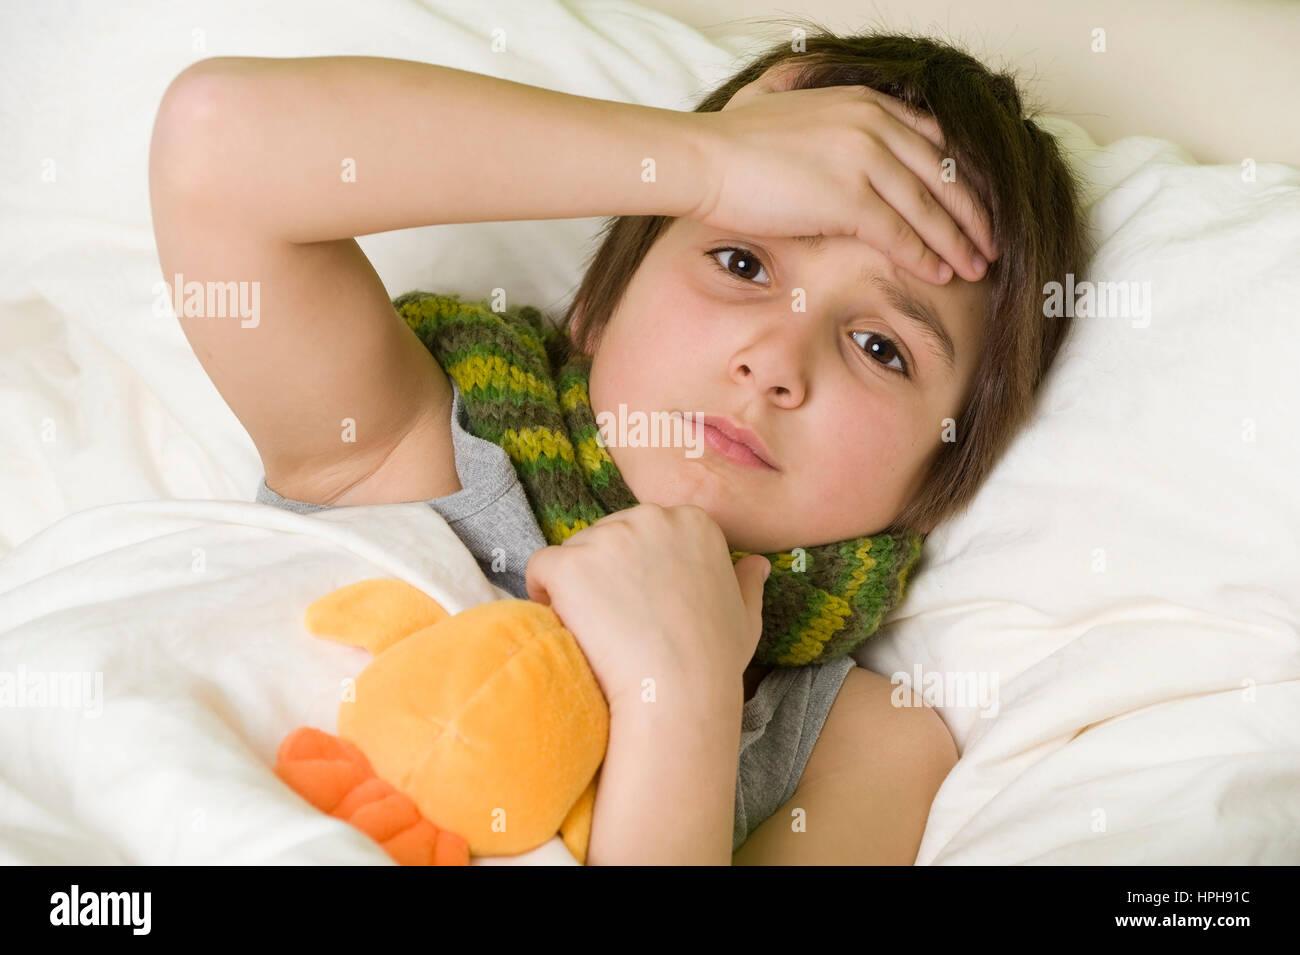 Kranker Junge im Bett - sick boy in bed, Model released Stock Photo